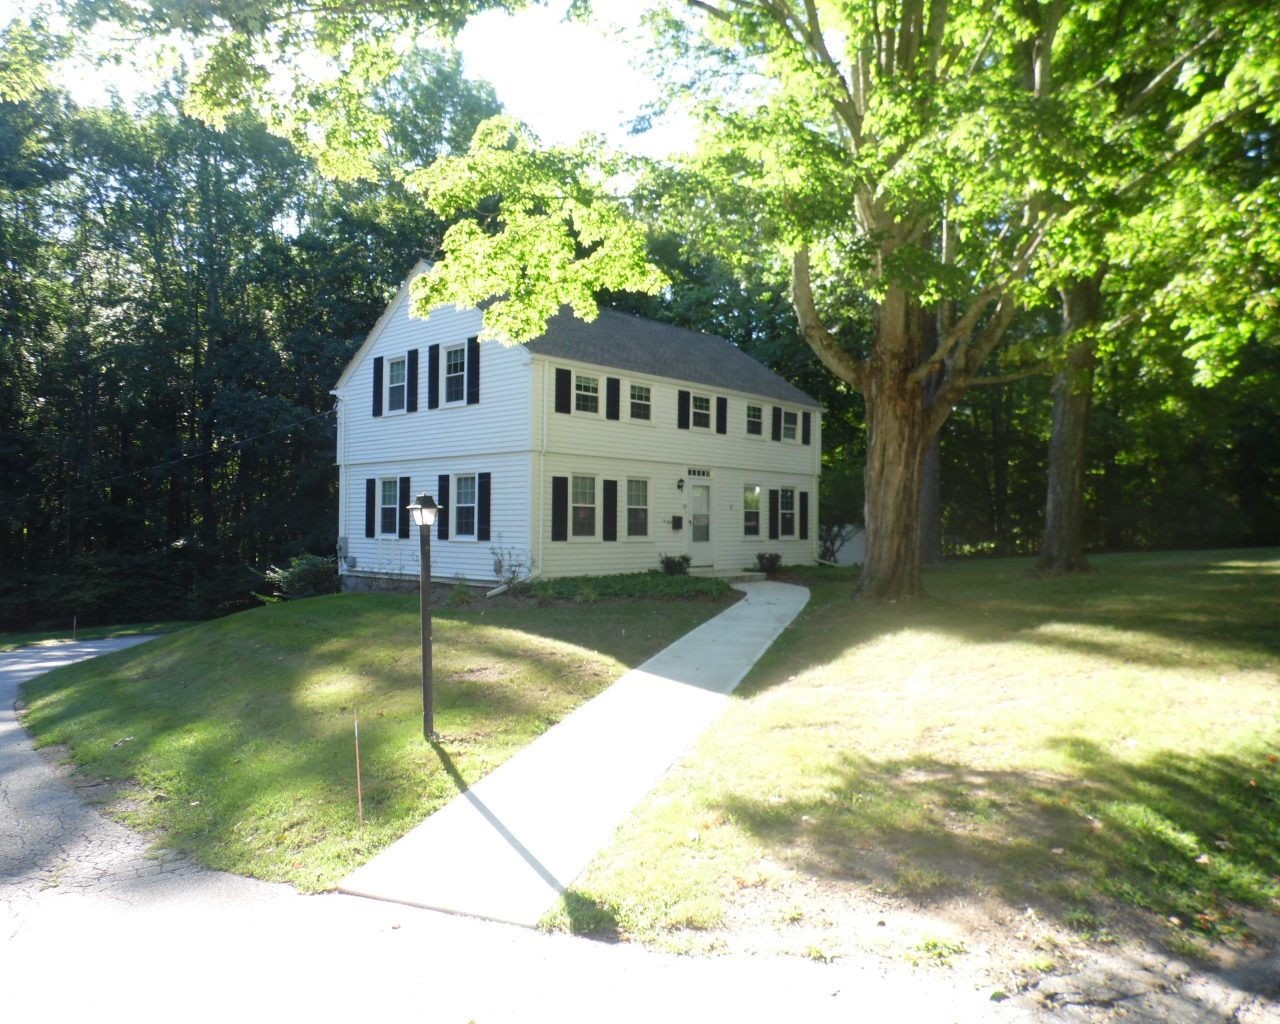 House 55 Side Elevation